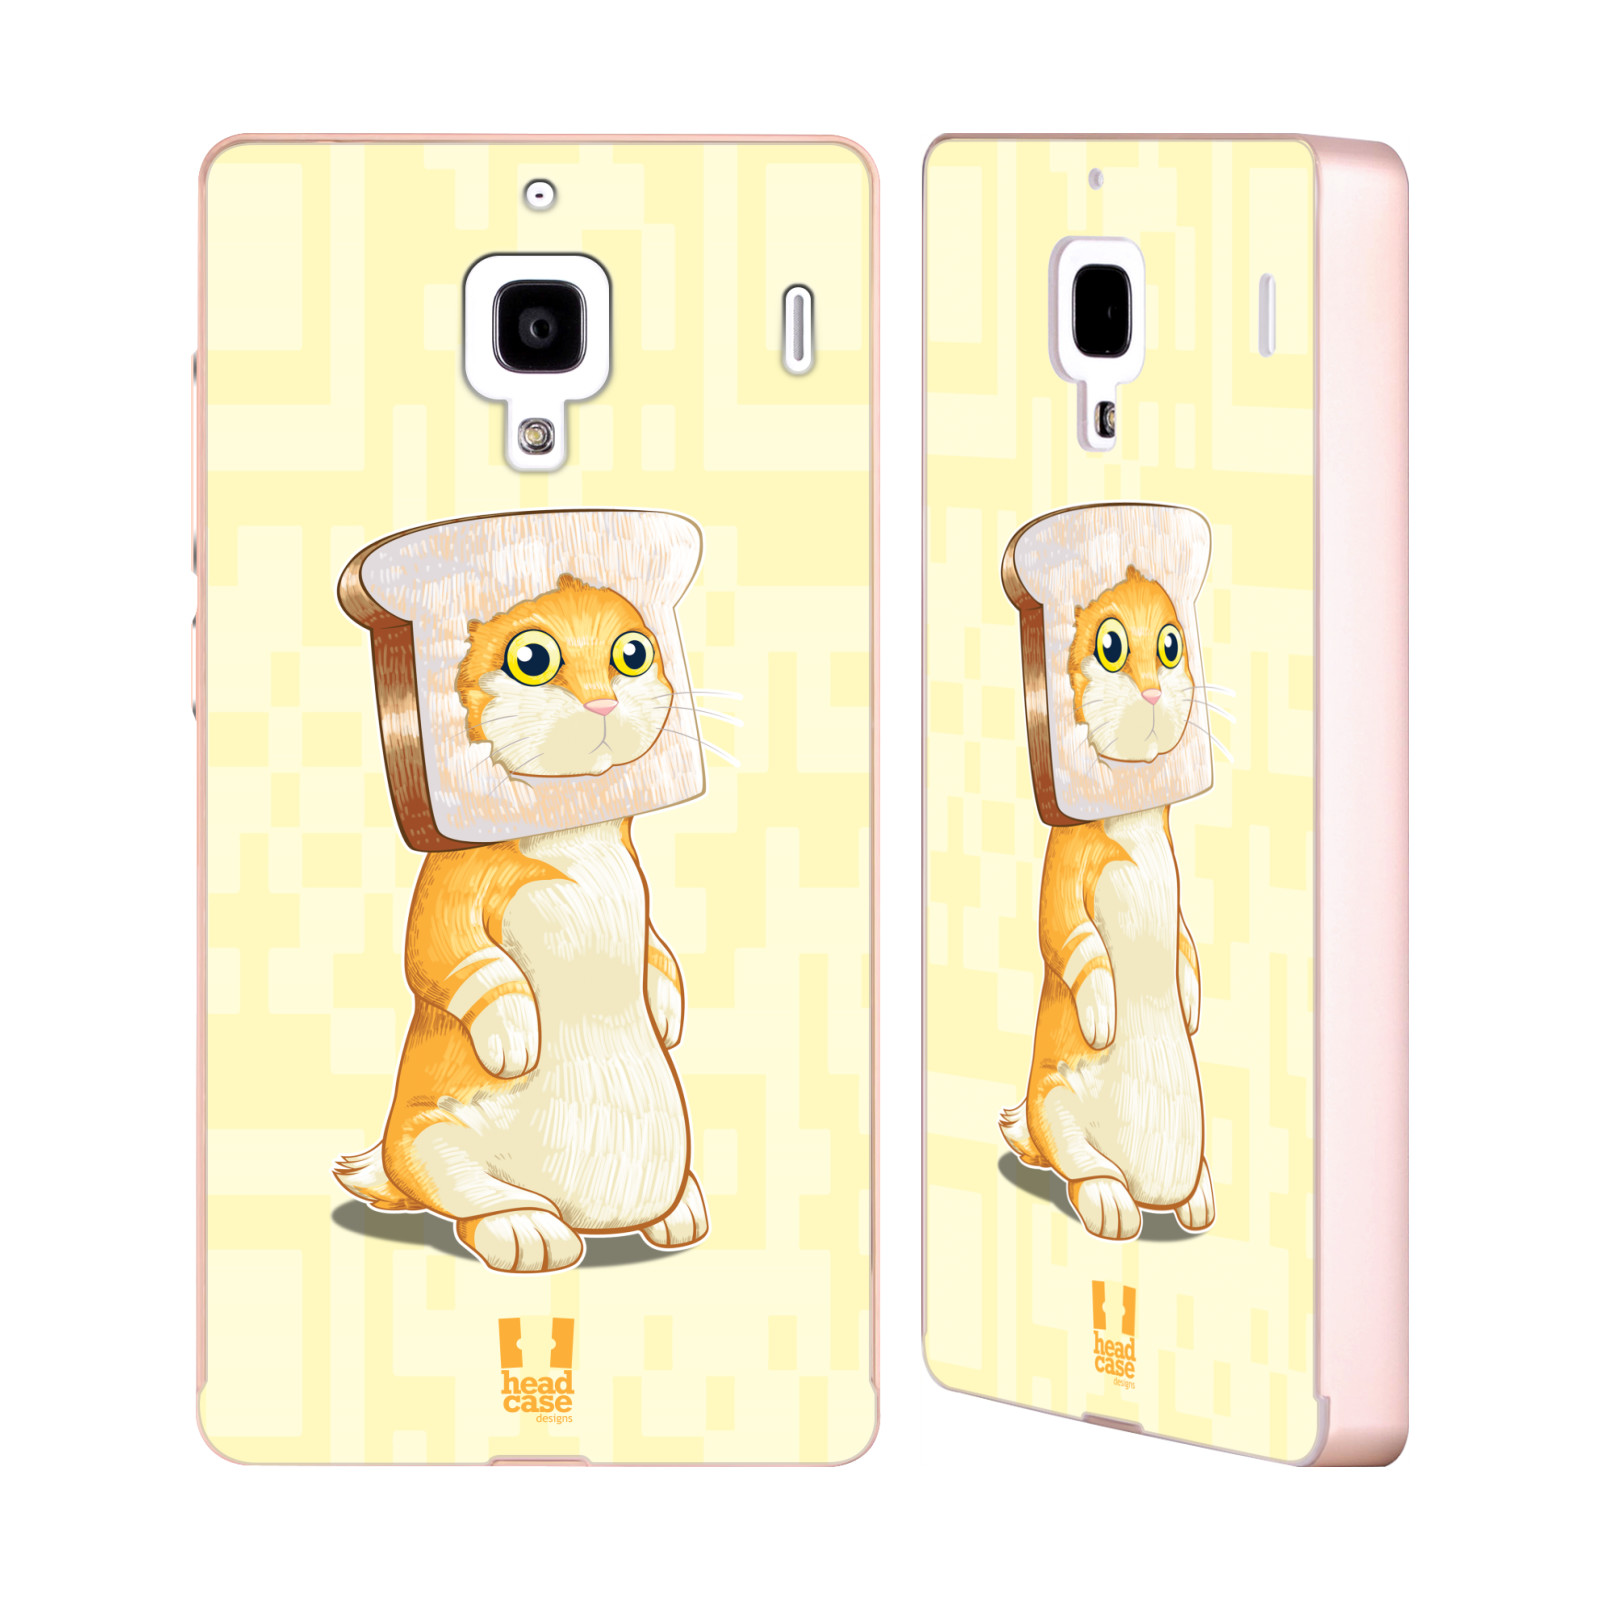 HEAD-CASE-DESIGNS-WUT-GOLD-ALUMINUM-BUMPER-SLIDER-CASE-FOR-HUAWEI-XIAOMI-PHONES